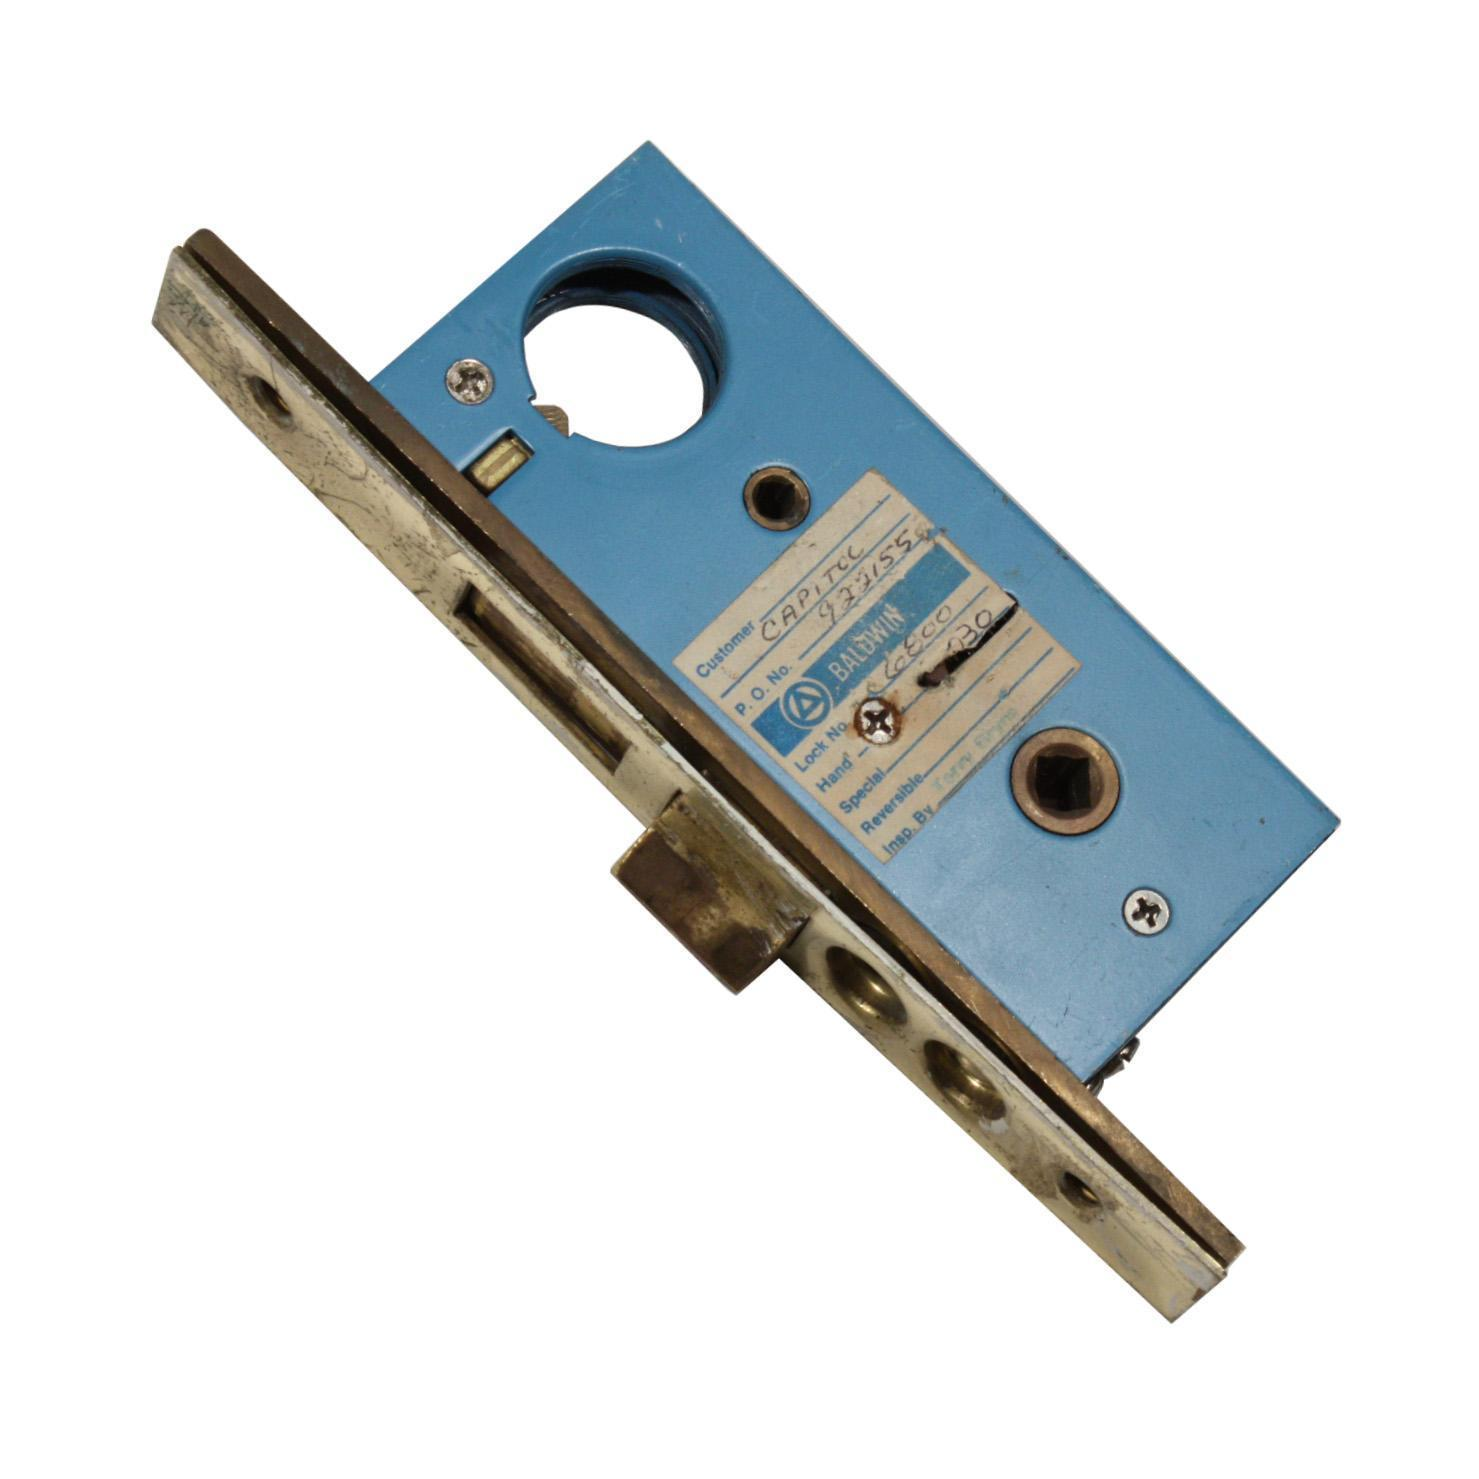 "Rare Antique Exterior Mortise Lock by Baldwin, Narrow 1-1/2"" Backset"